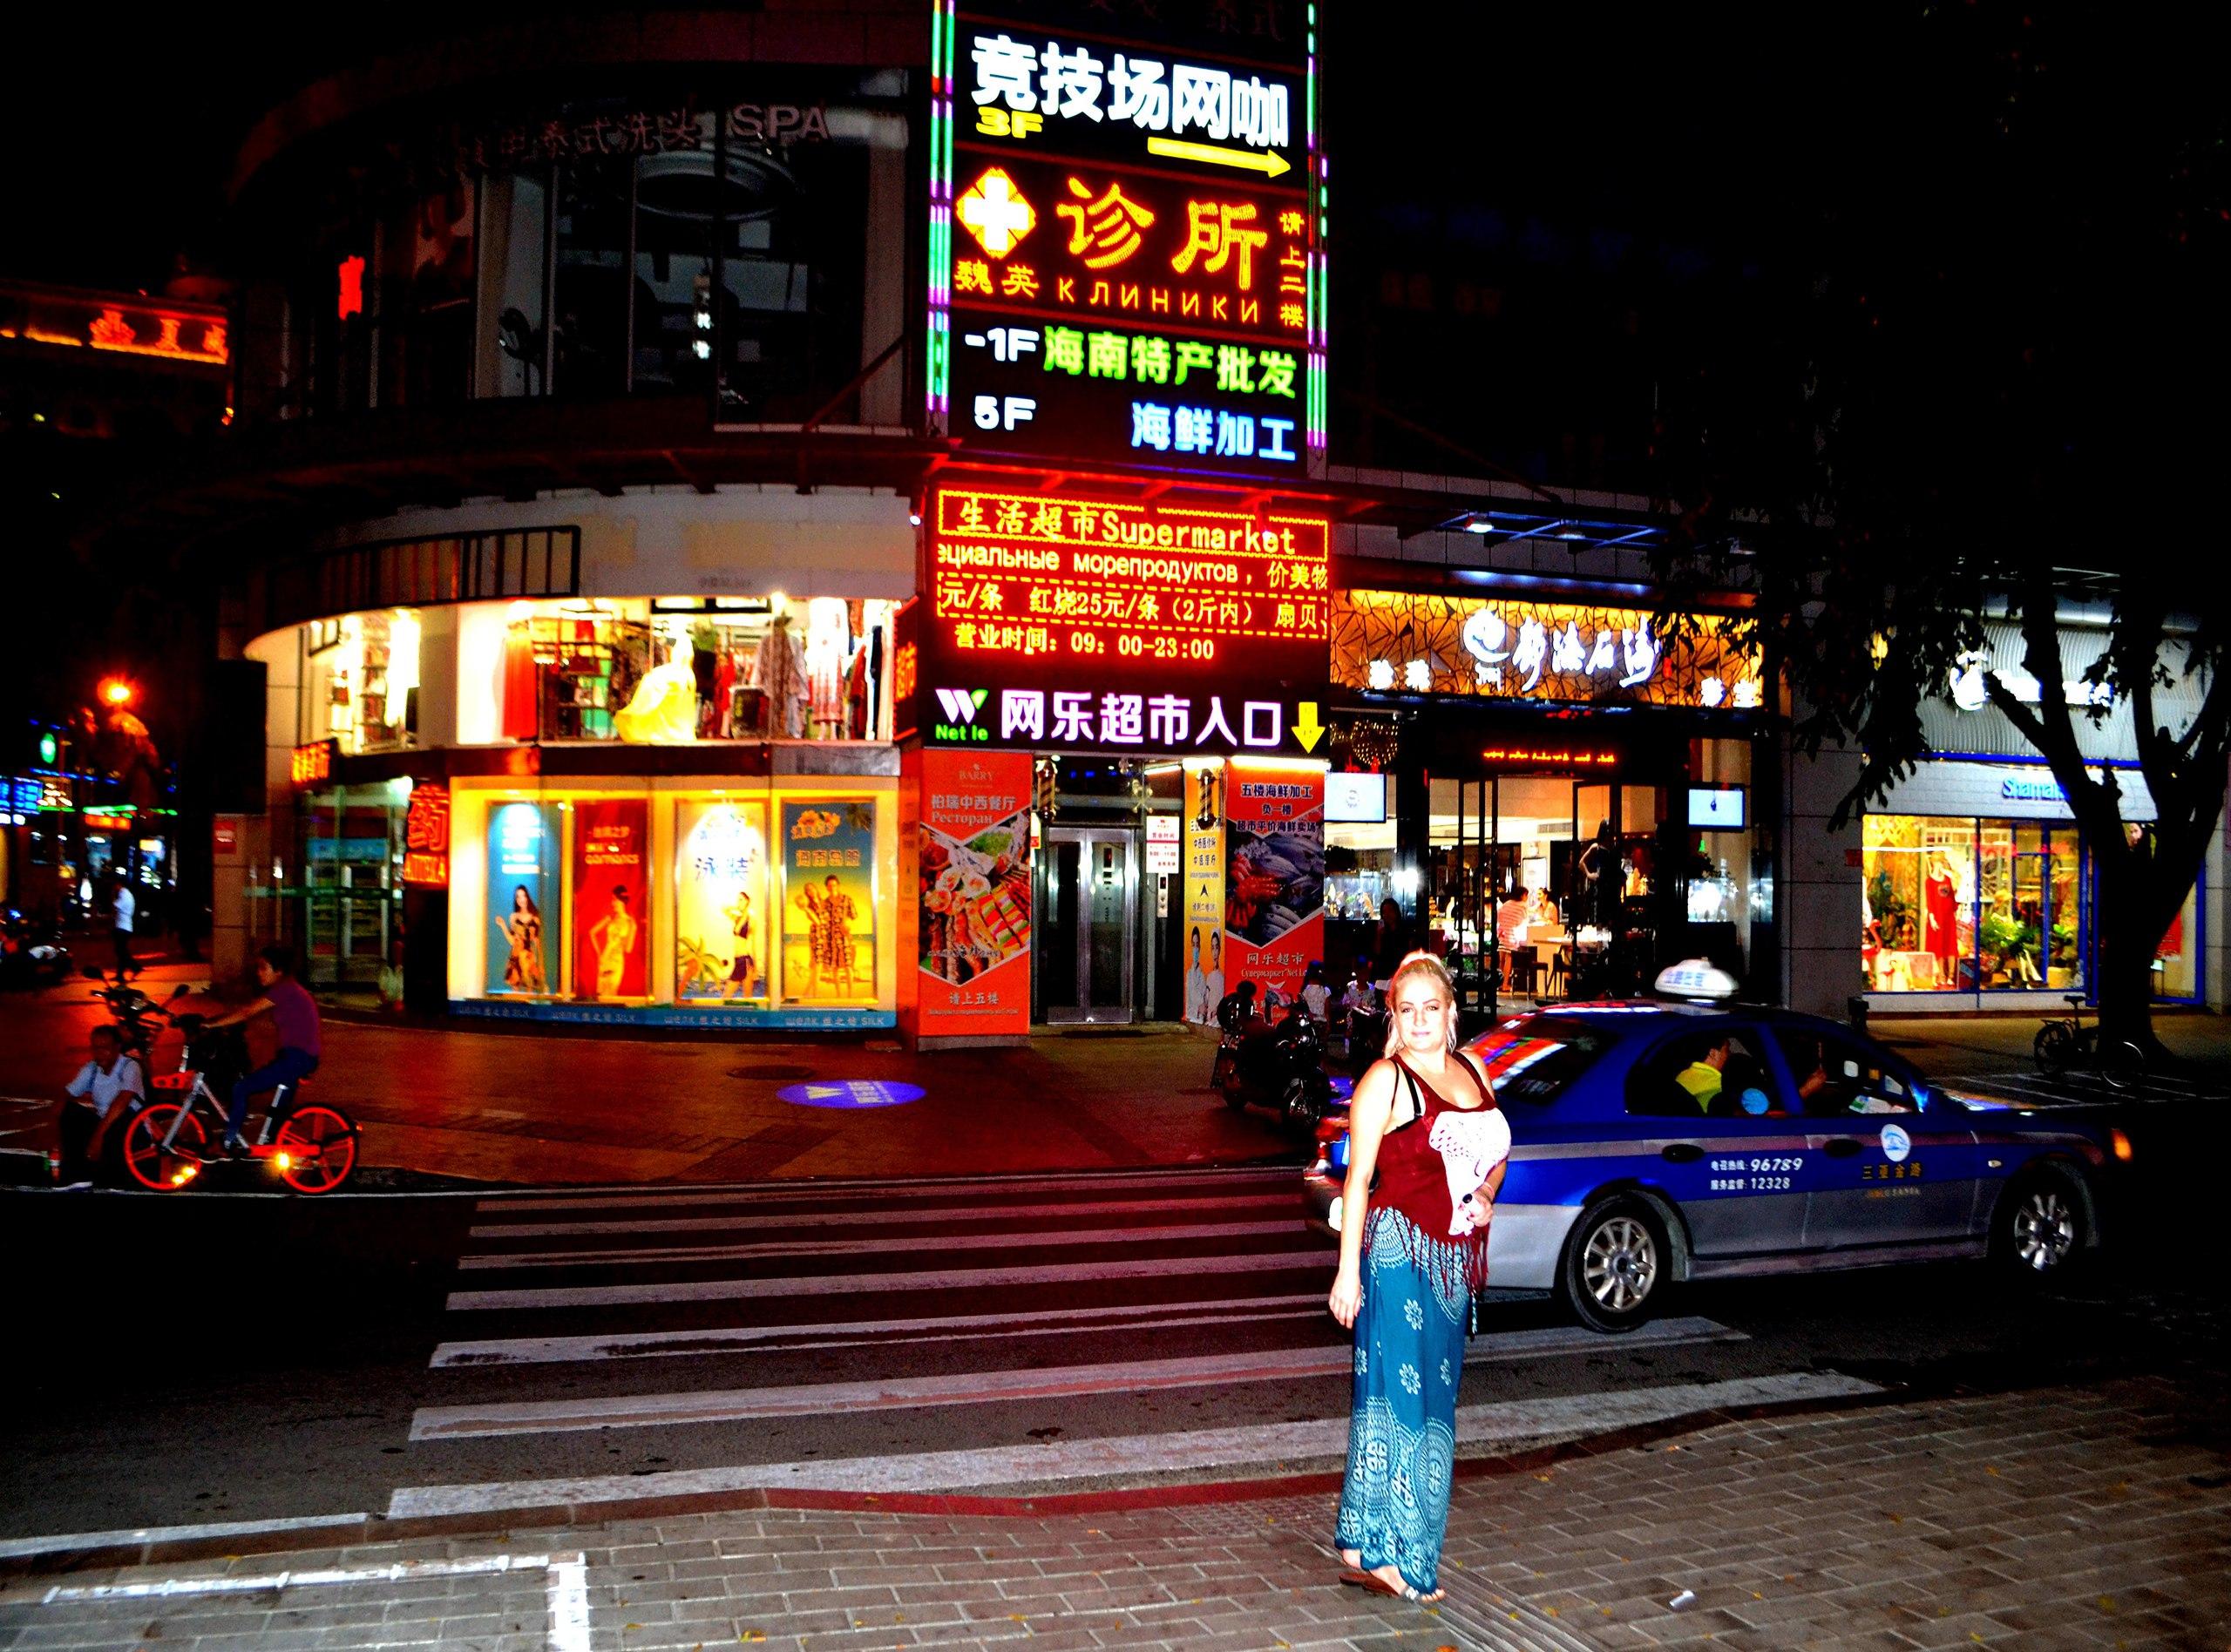 Елена Руденко (Валтея). Китай, о.Хайнань, г.Санья. (фото) - Страница 2 O1Ilth67sM8